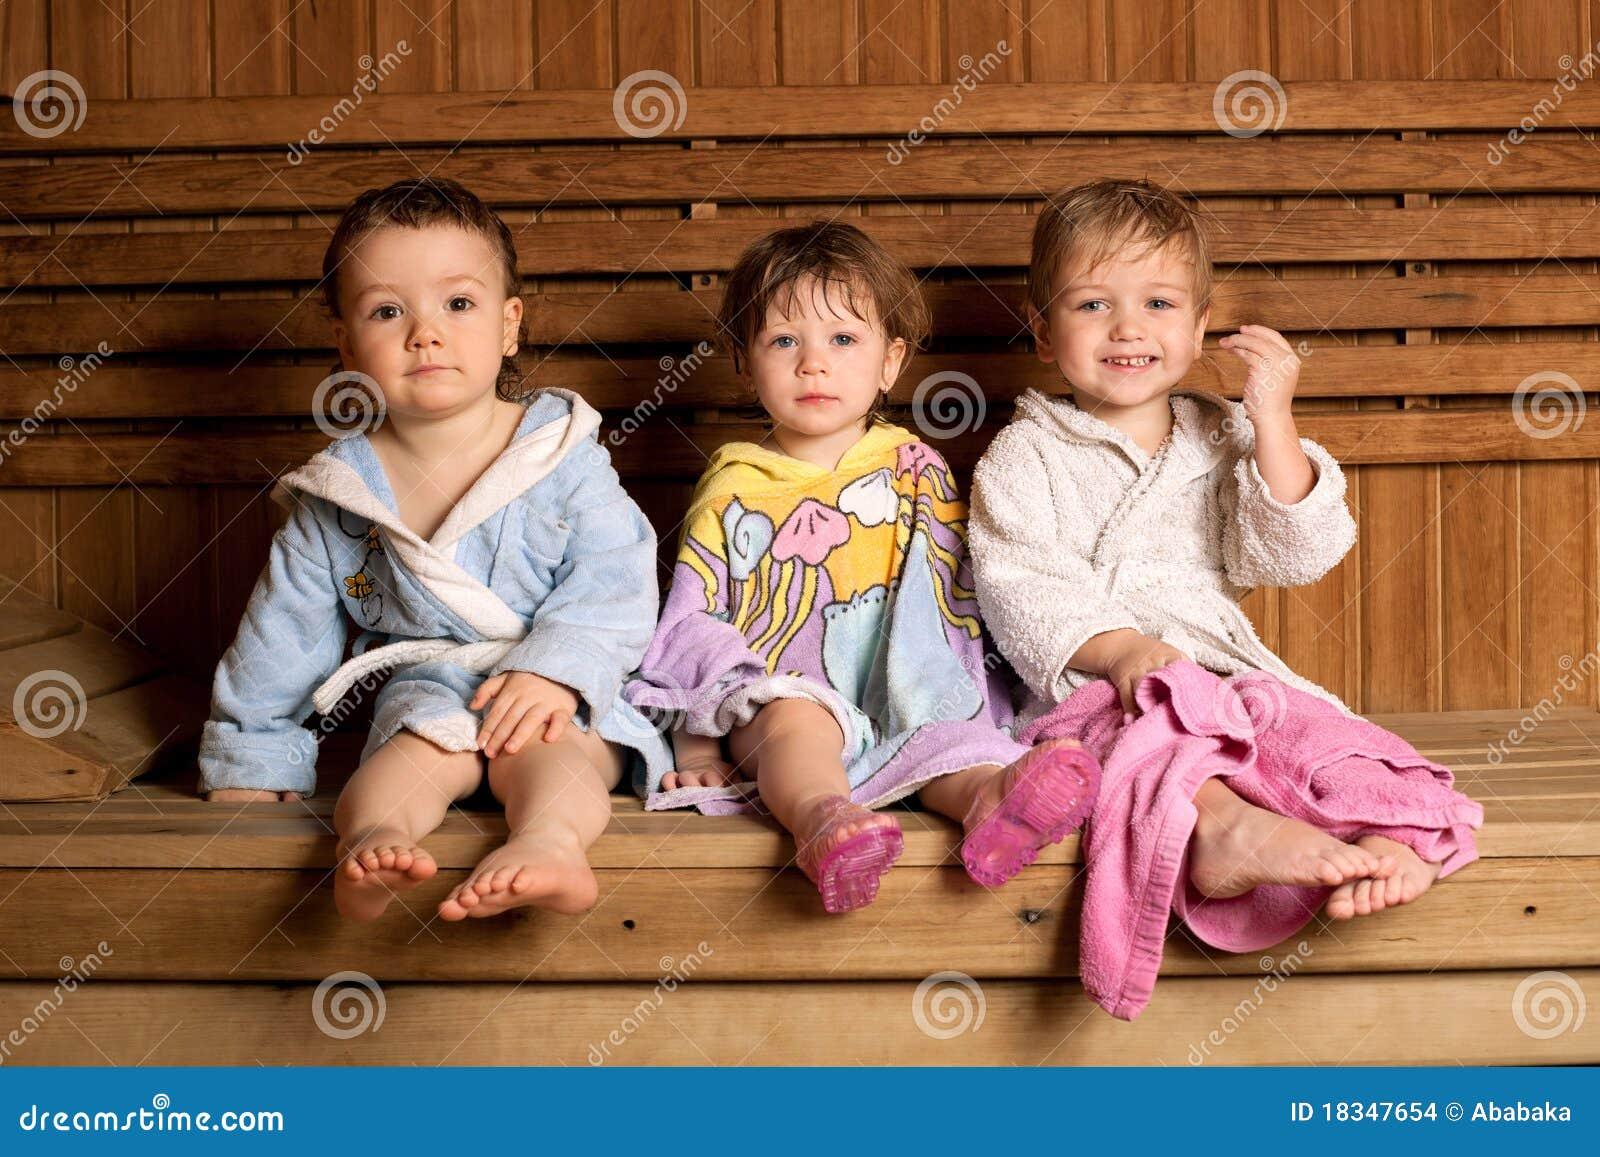 three funny children in sauna stock photo image 18347654. Black Bedroom Furniture Sets. Home Design Ideas